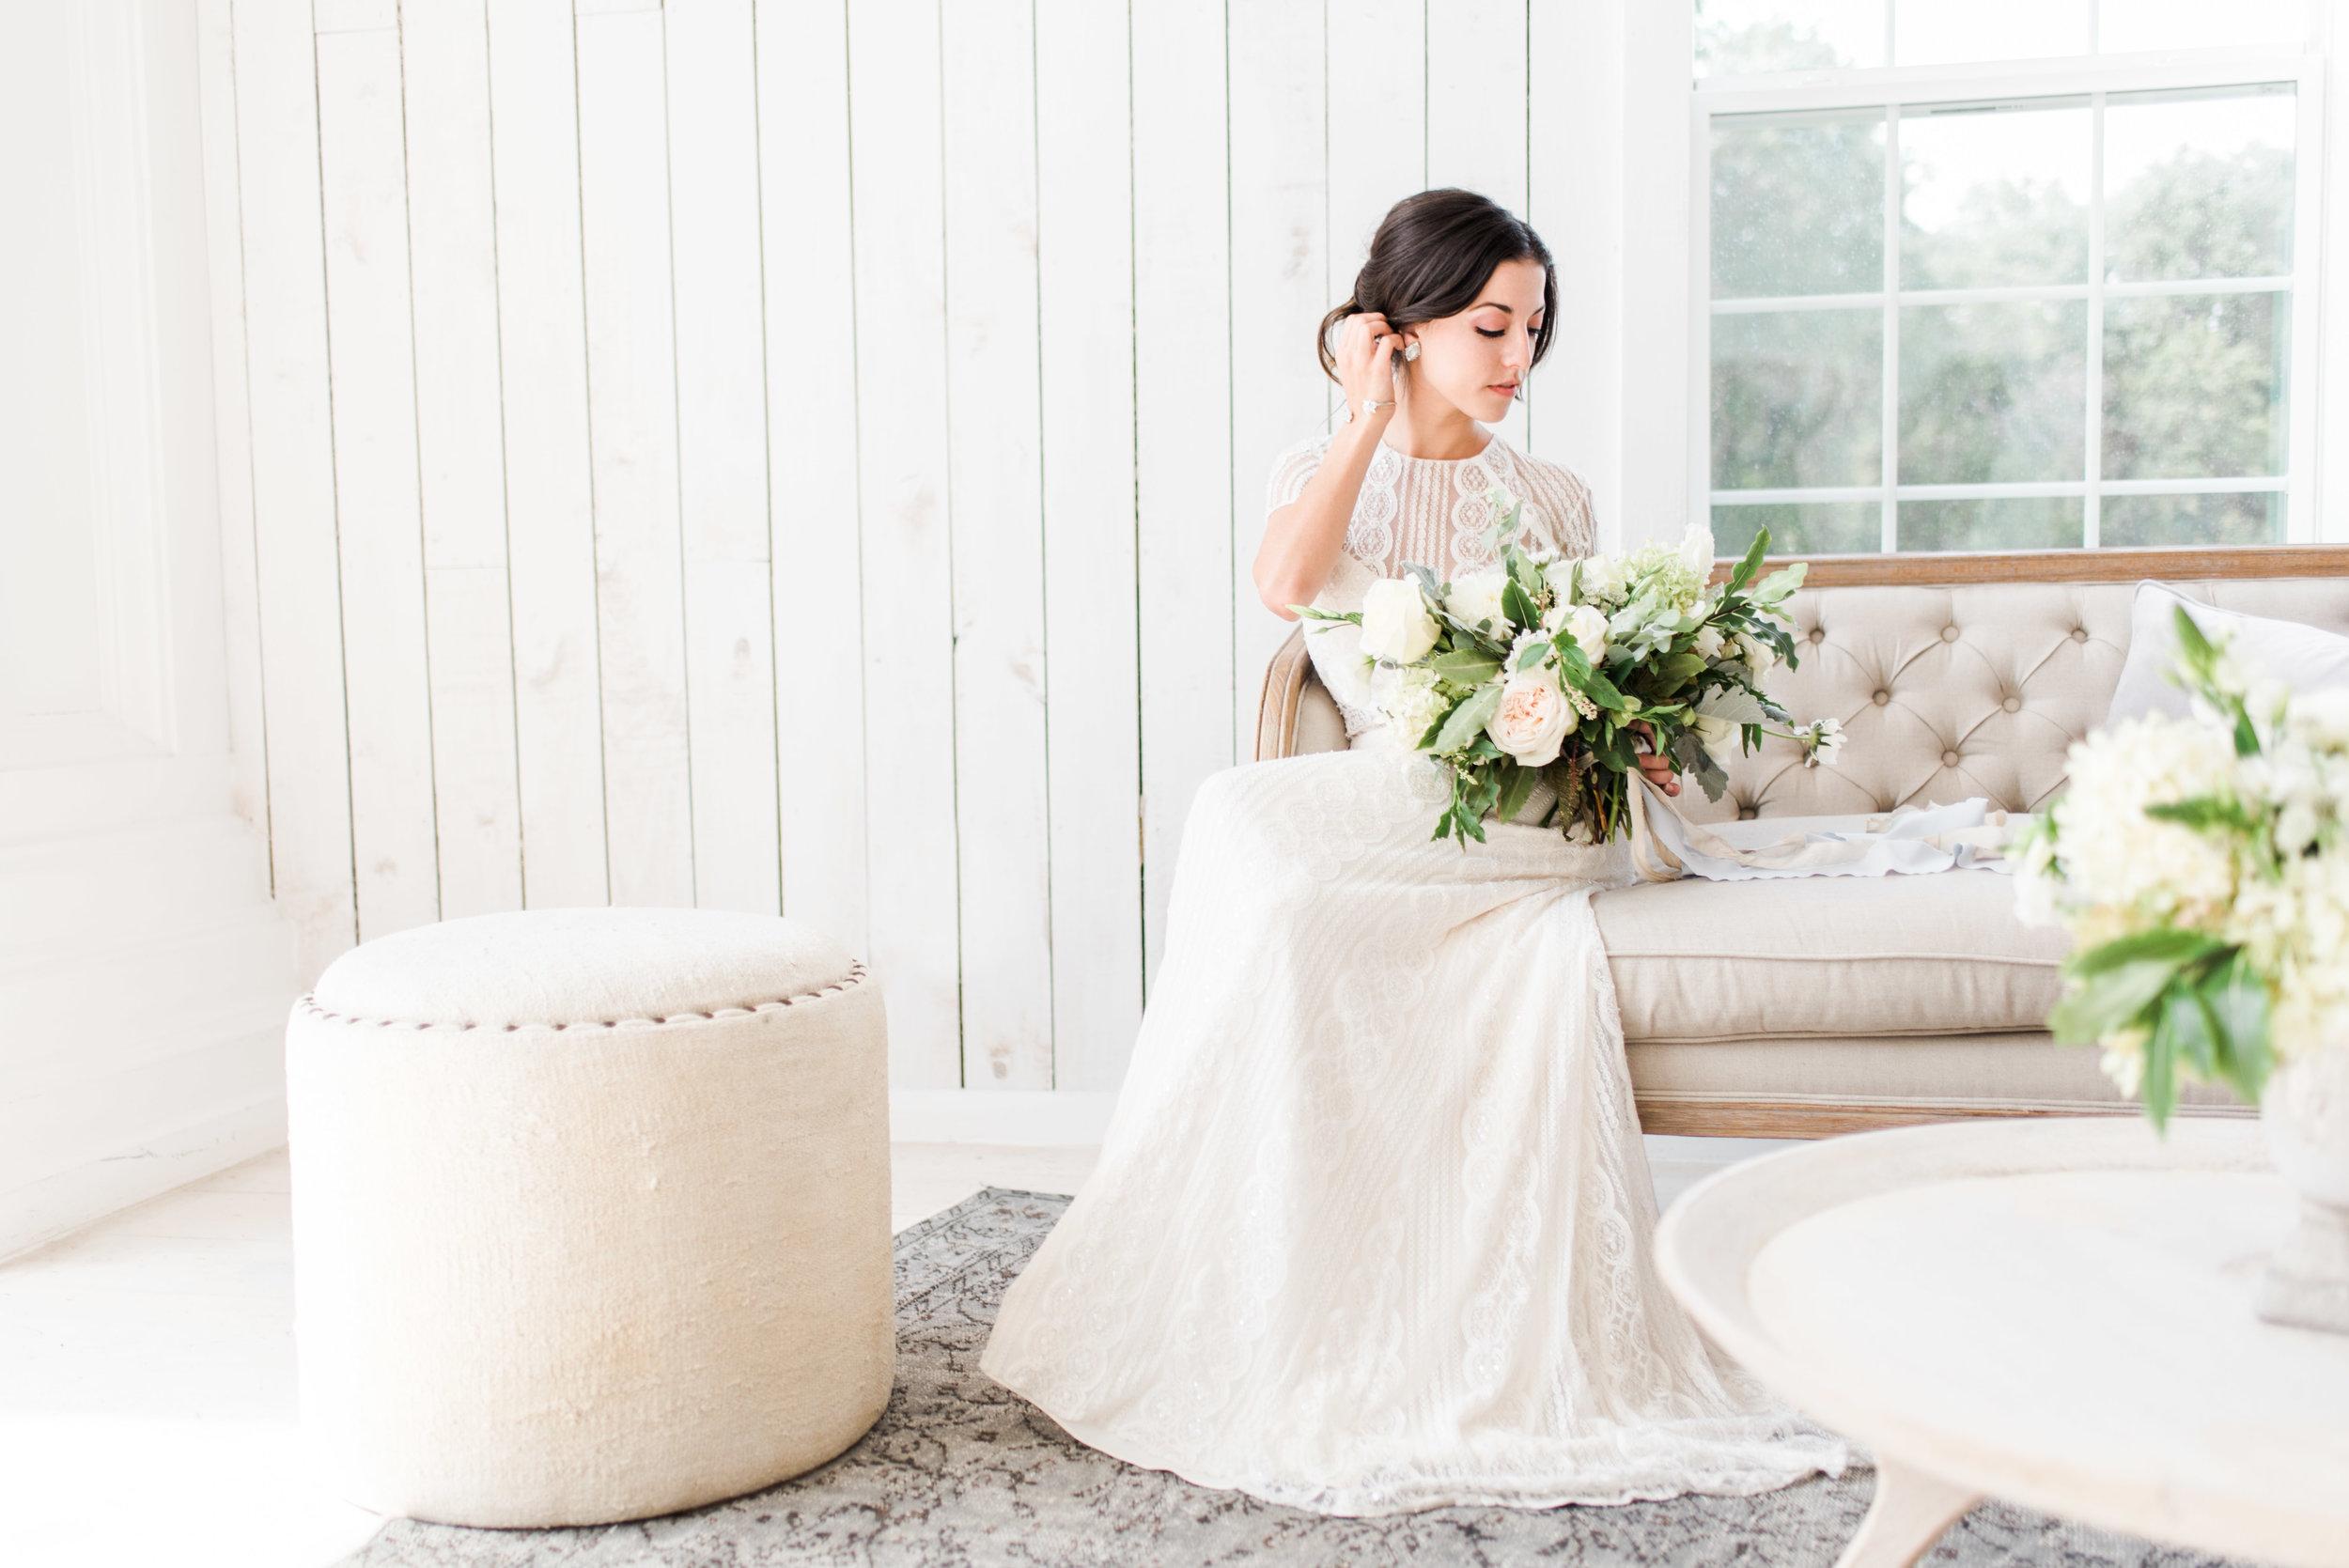 gray-door-photography-wedding-photographer-steph-erffmeyer-dallas-destination-bridal14.jpg